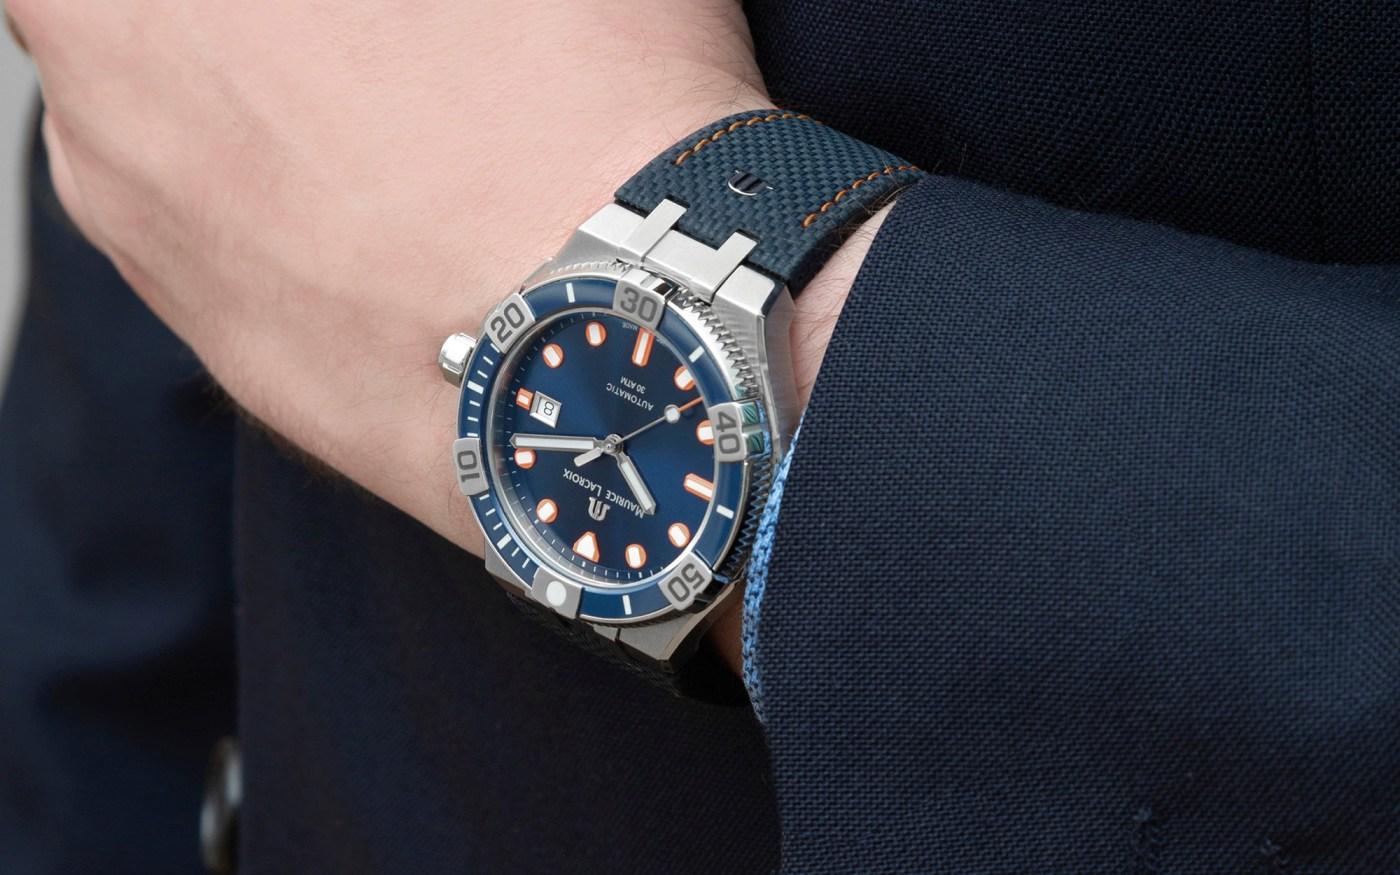 Maurice Lacroix TimeCode Venturer wristshot